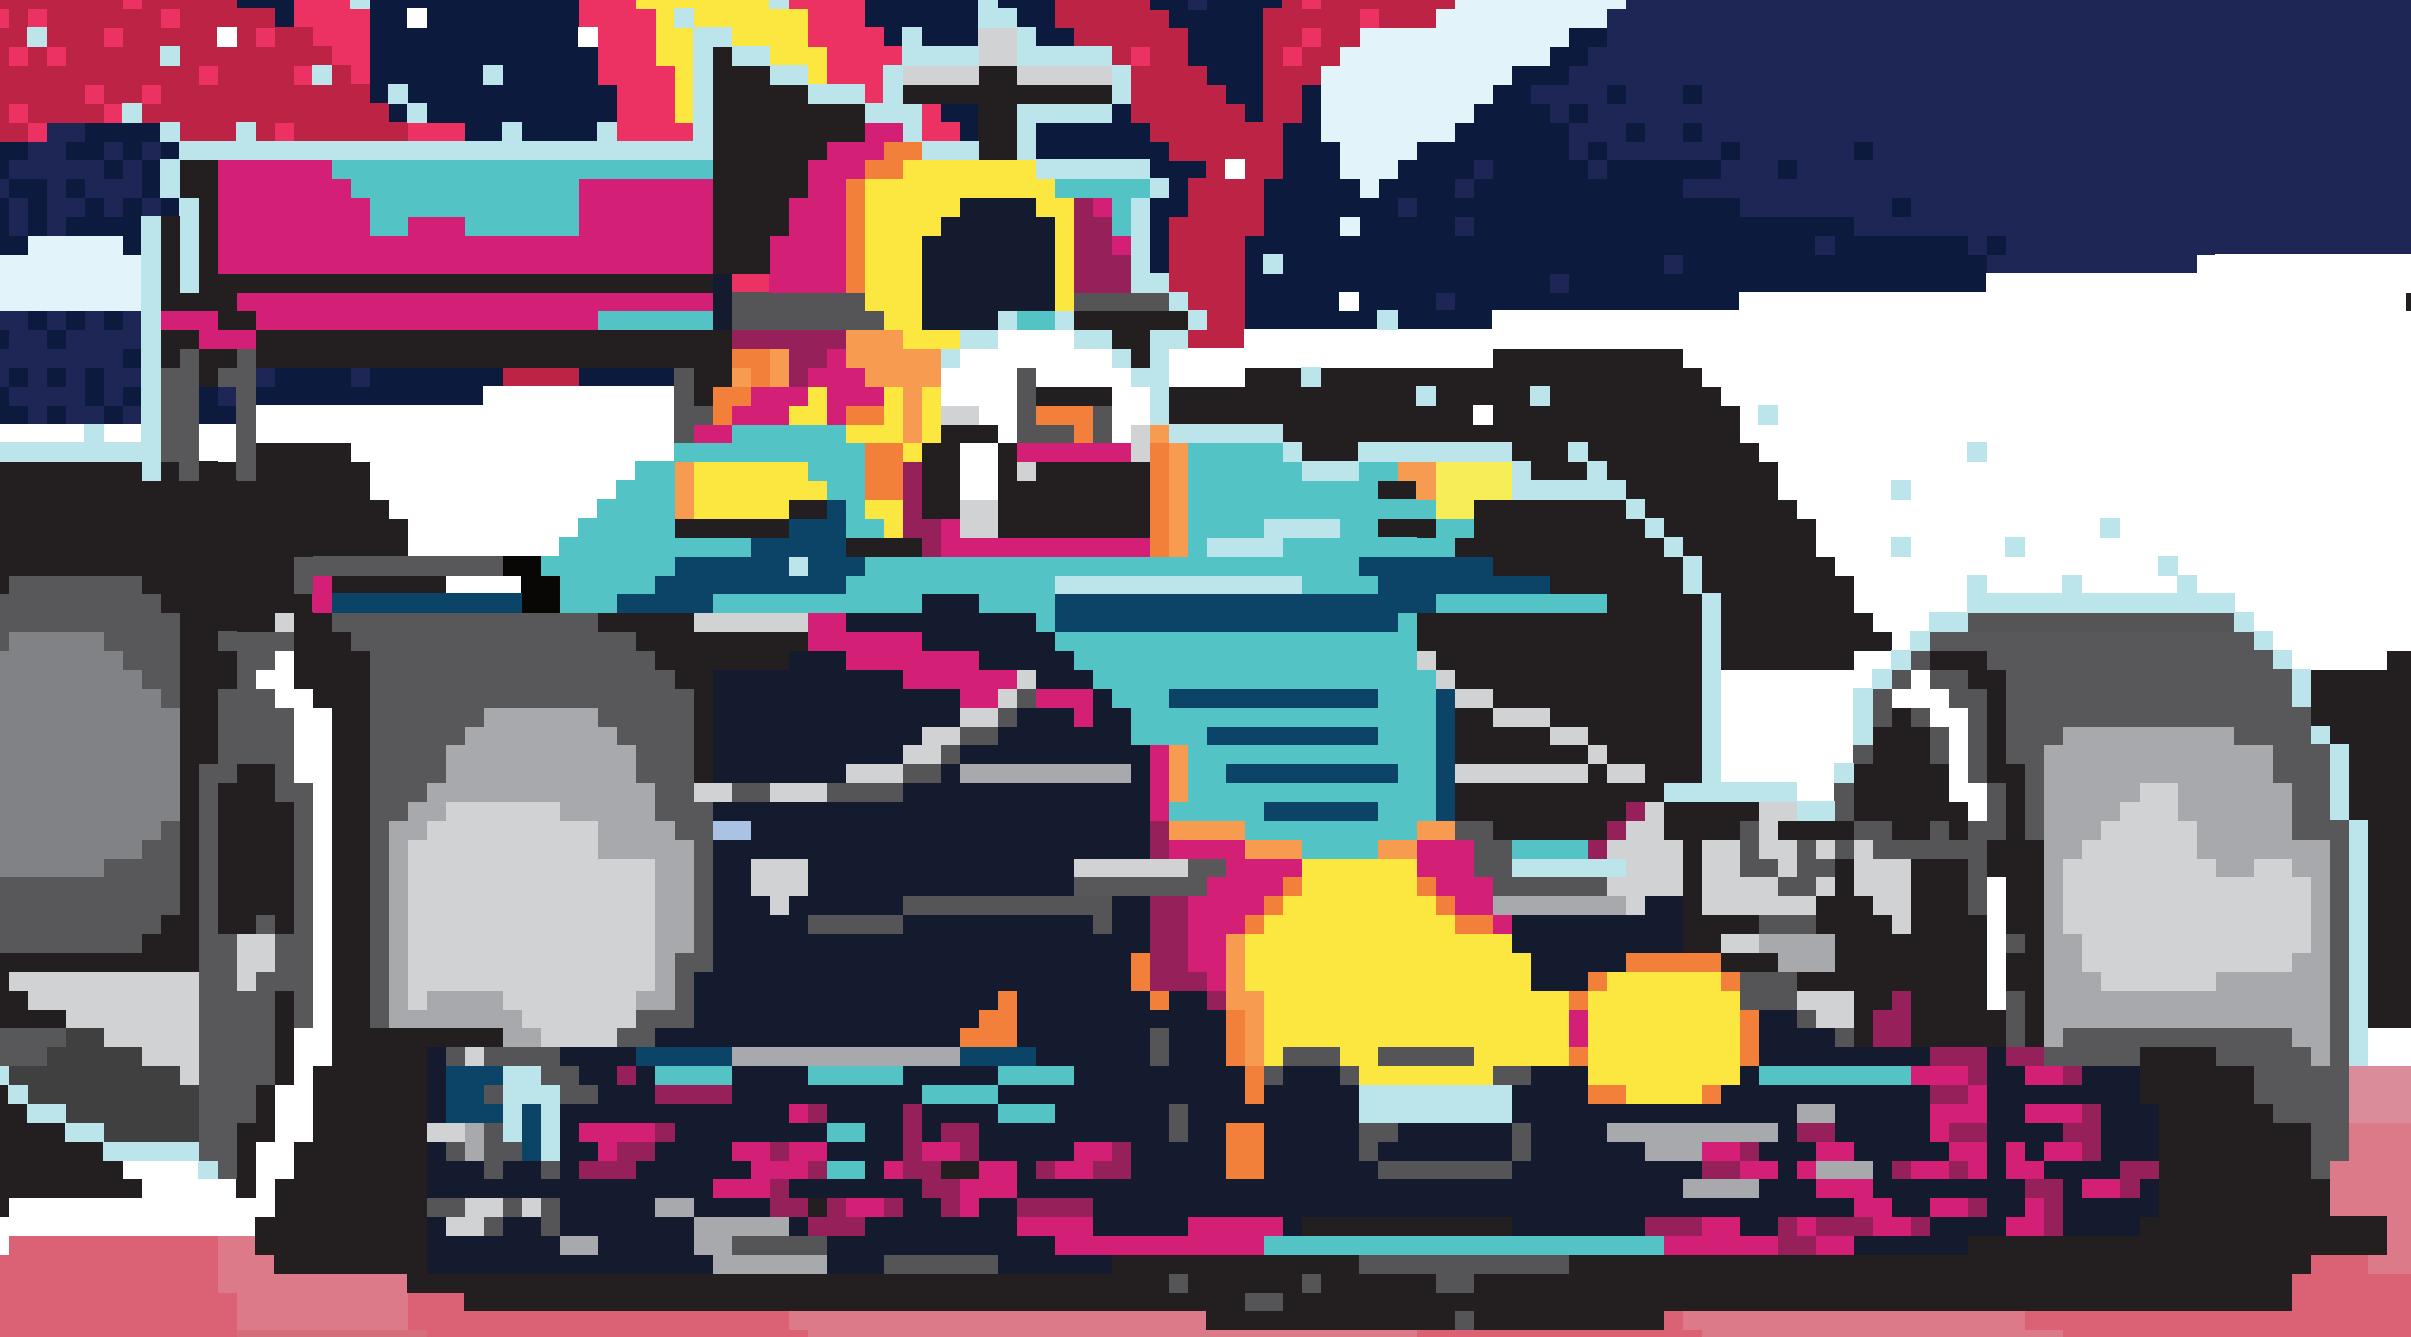 Zouk F1 Checkpoint